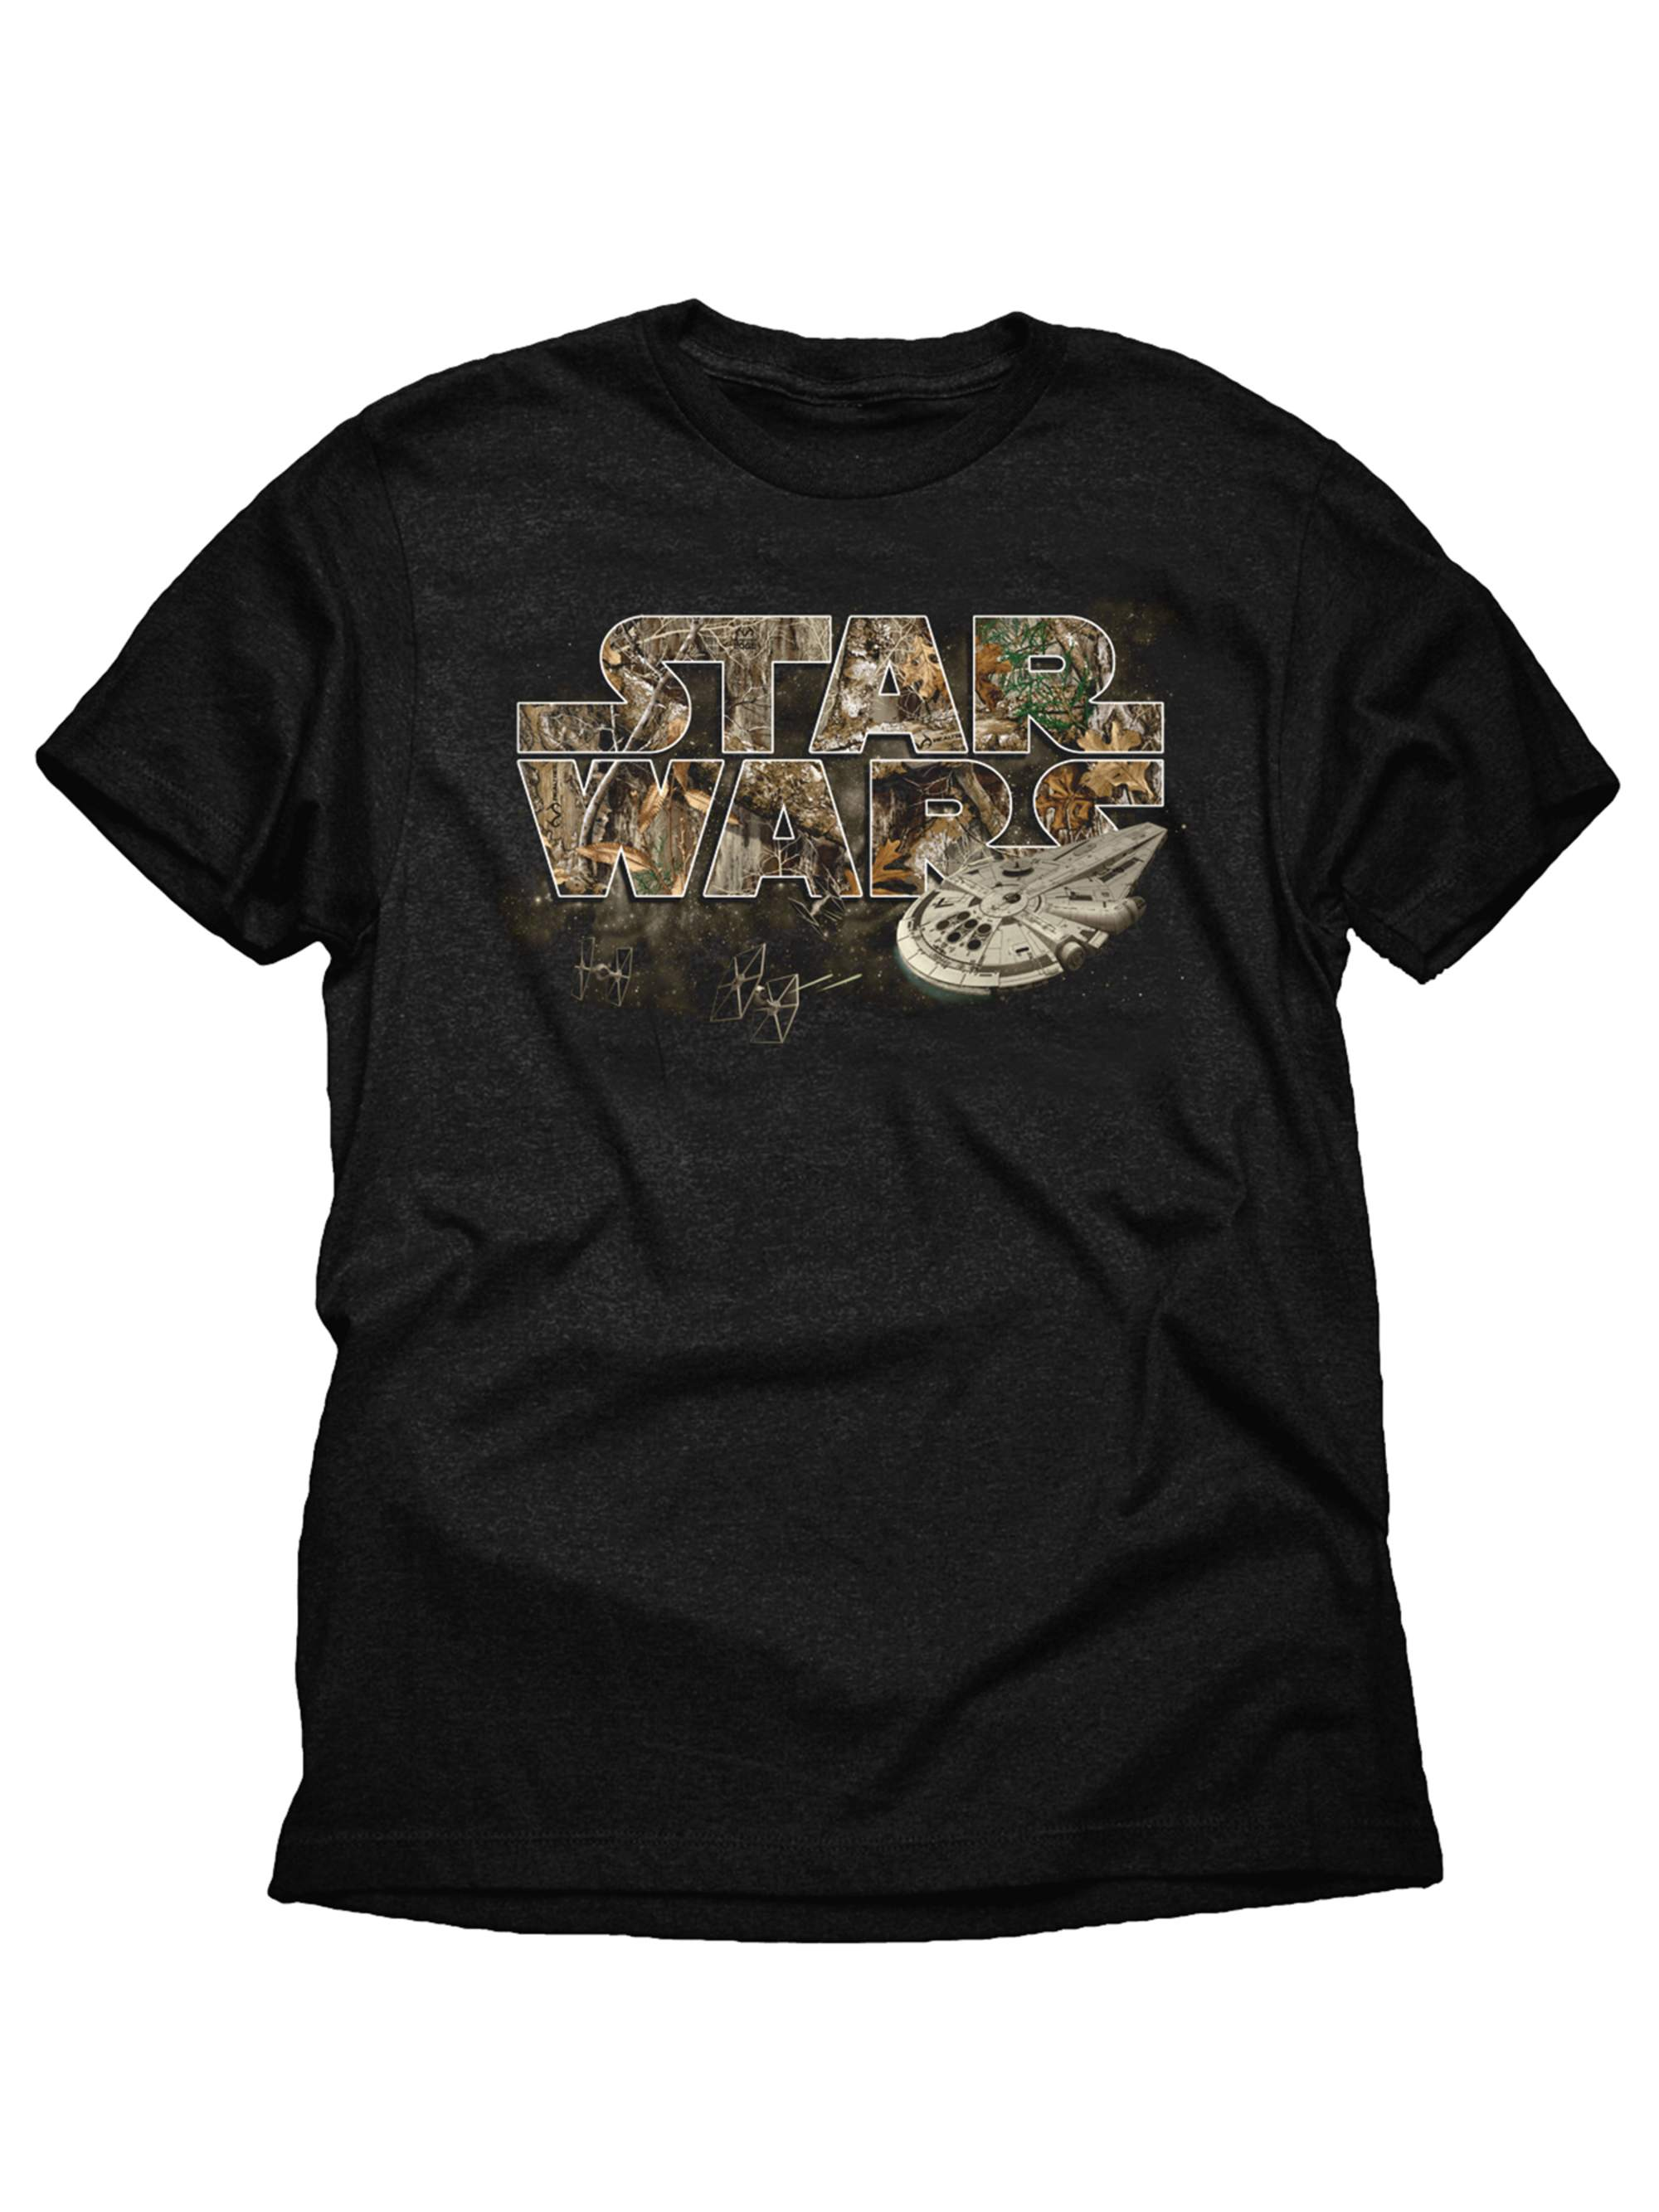 Solo: A Star Wars Story Millennium Falcon Realtree Boys Black Graphic T-Shirt